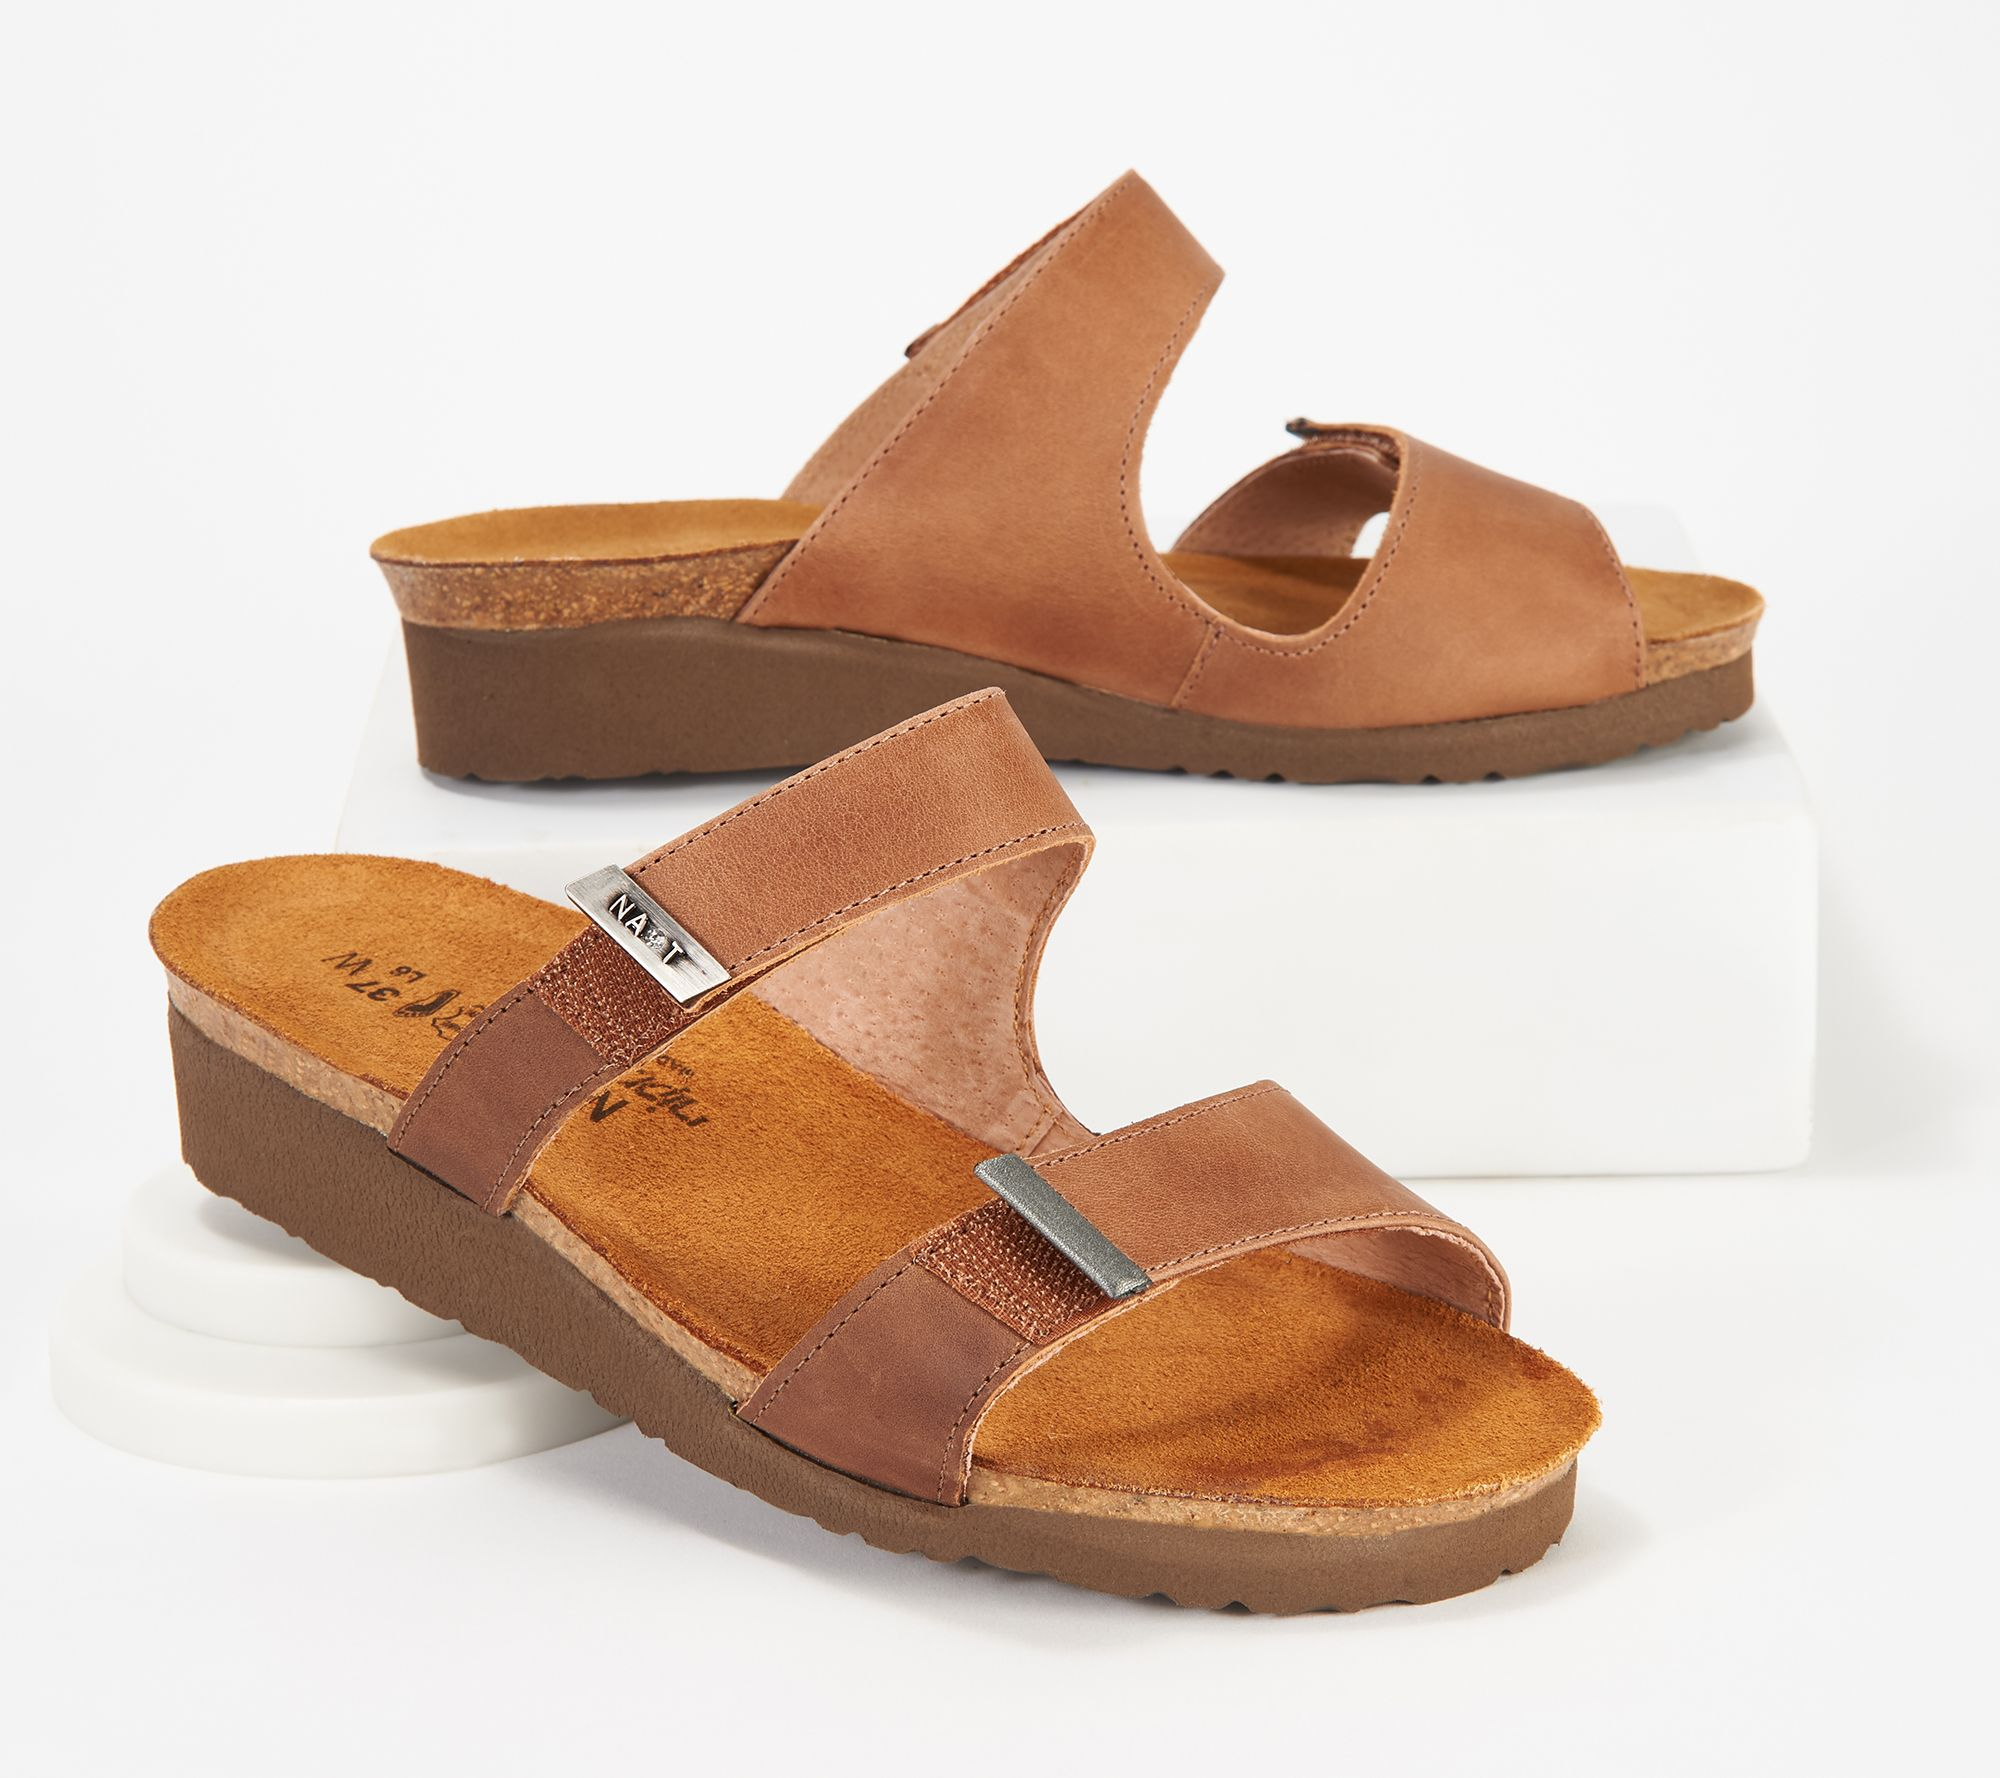 Naot Leather Slide Wedge Sandals — QVC.com fca50717a0f